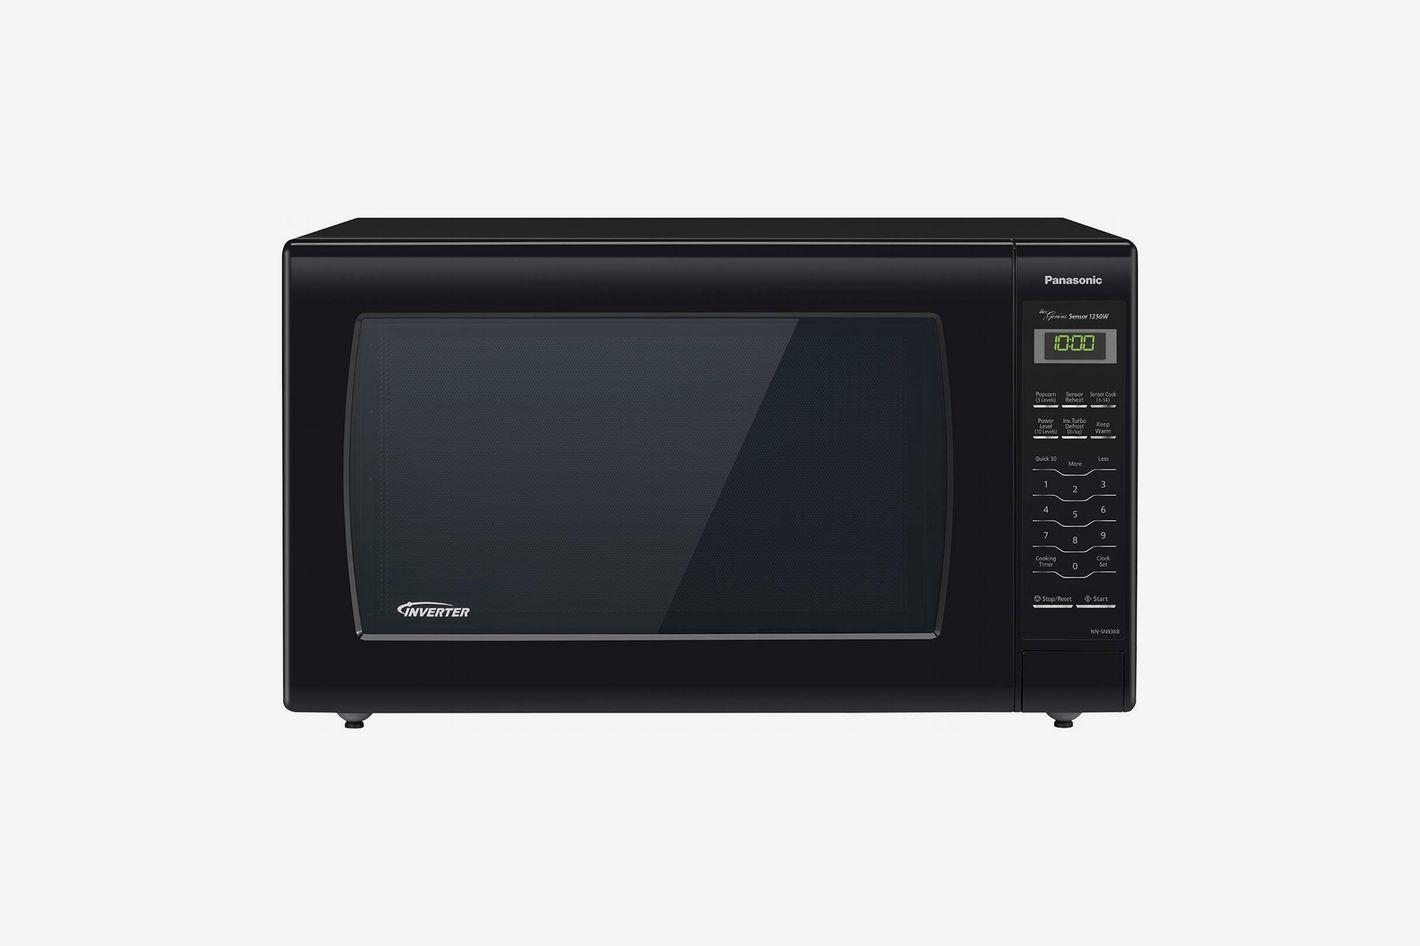 Panasonic Microwave Oven NN-SN766S